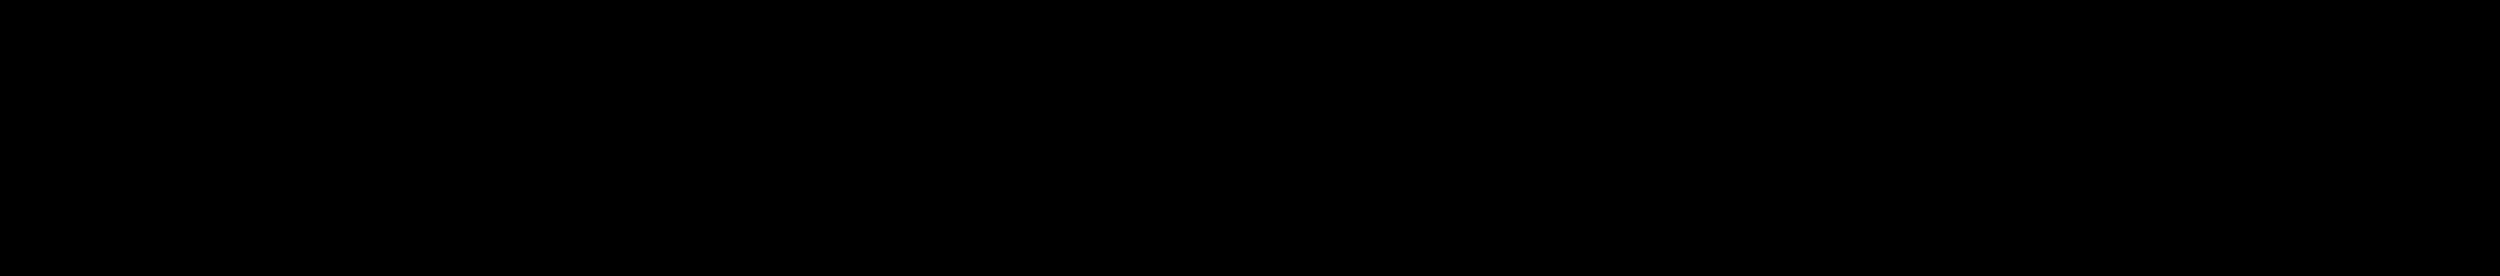 SQRMS Logo Black.png